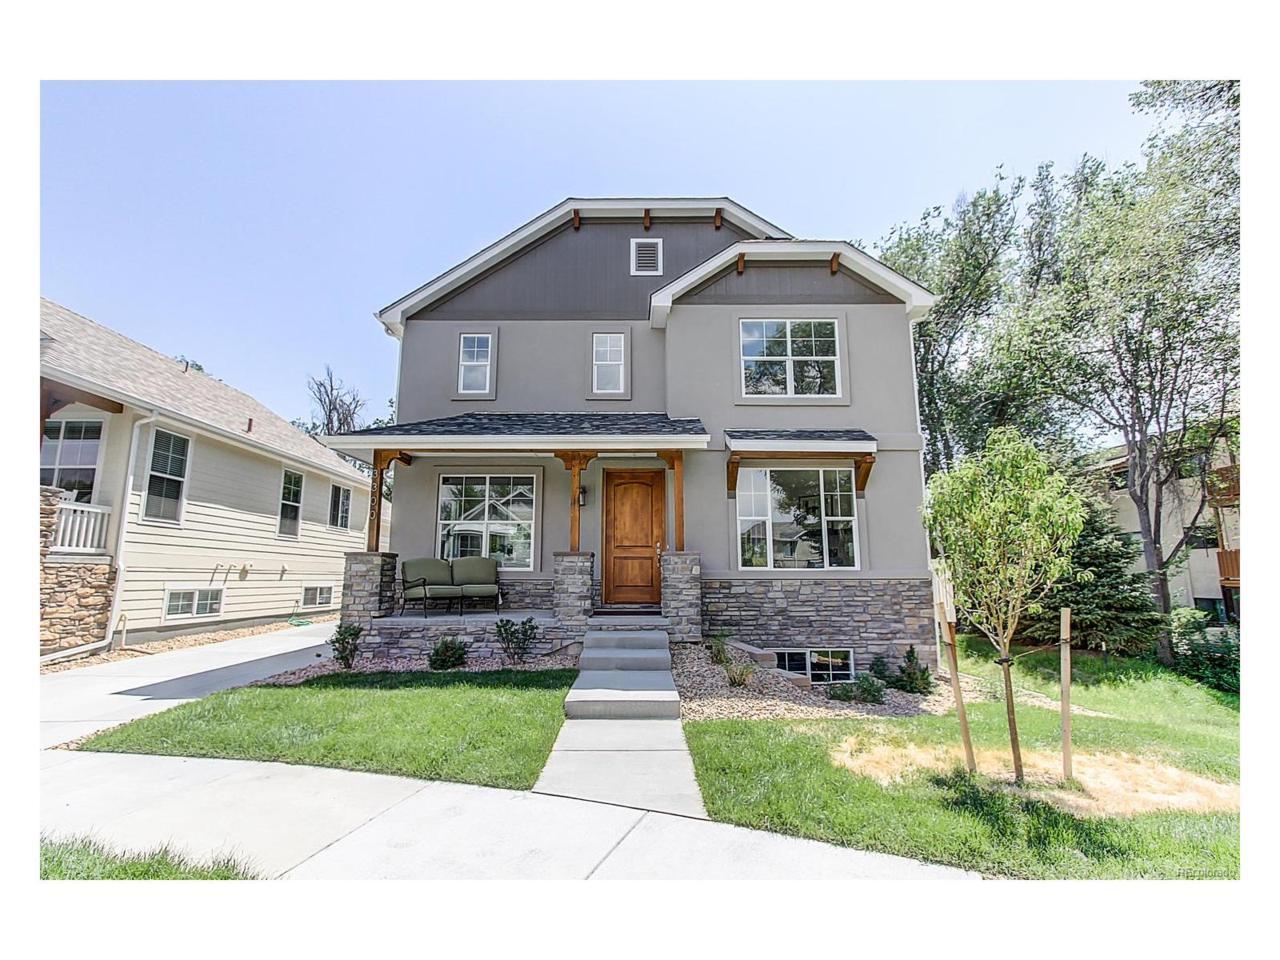 3300 Yukon Court, Wheat Ridge, CO 80033 (MLS #8890298) :: 8z Real Estate